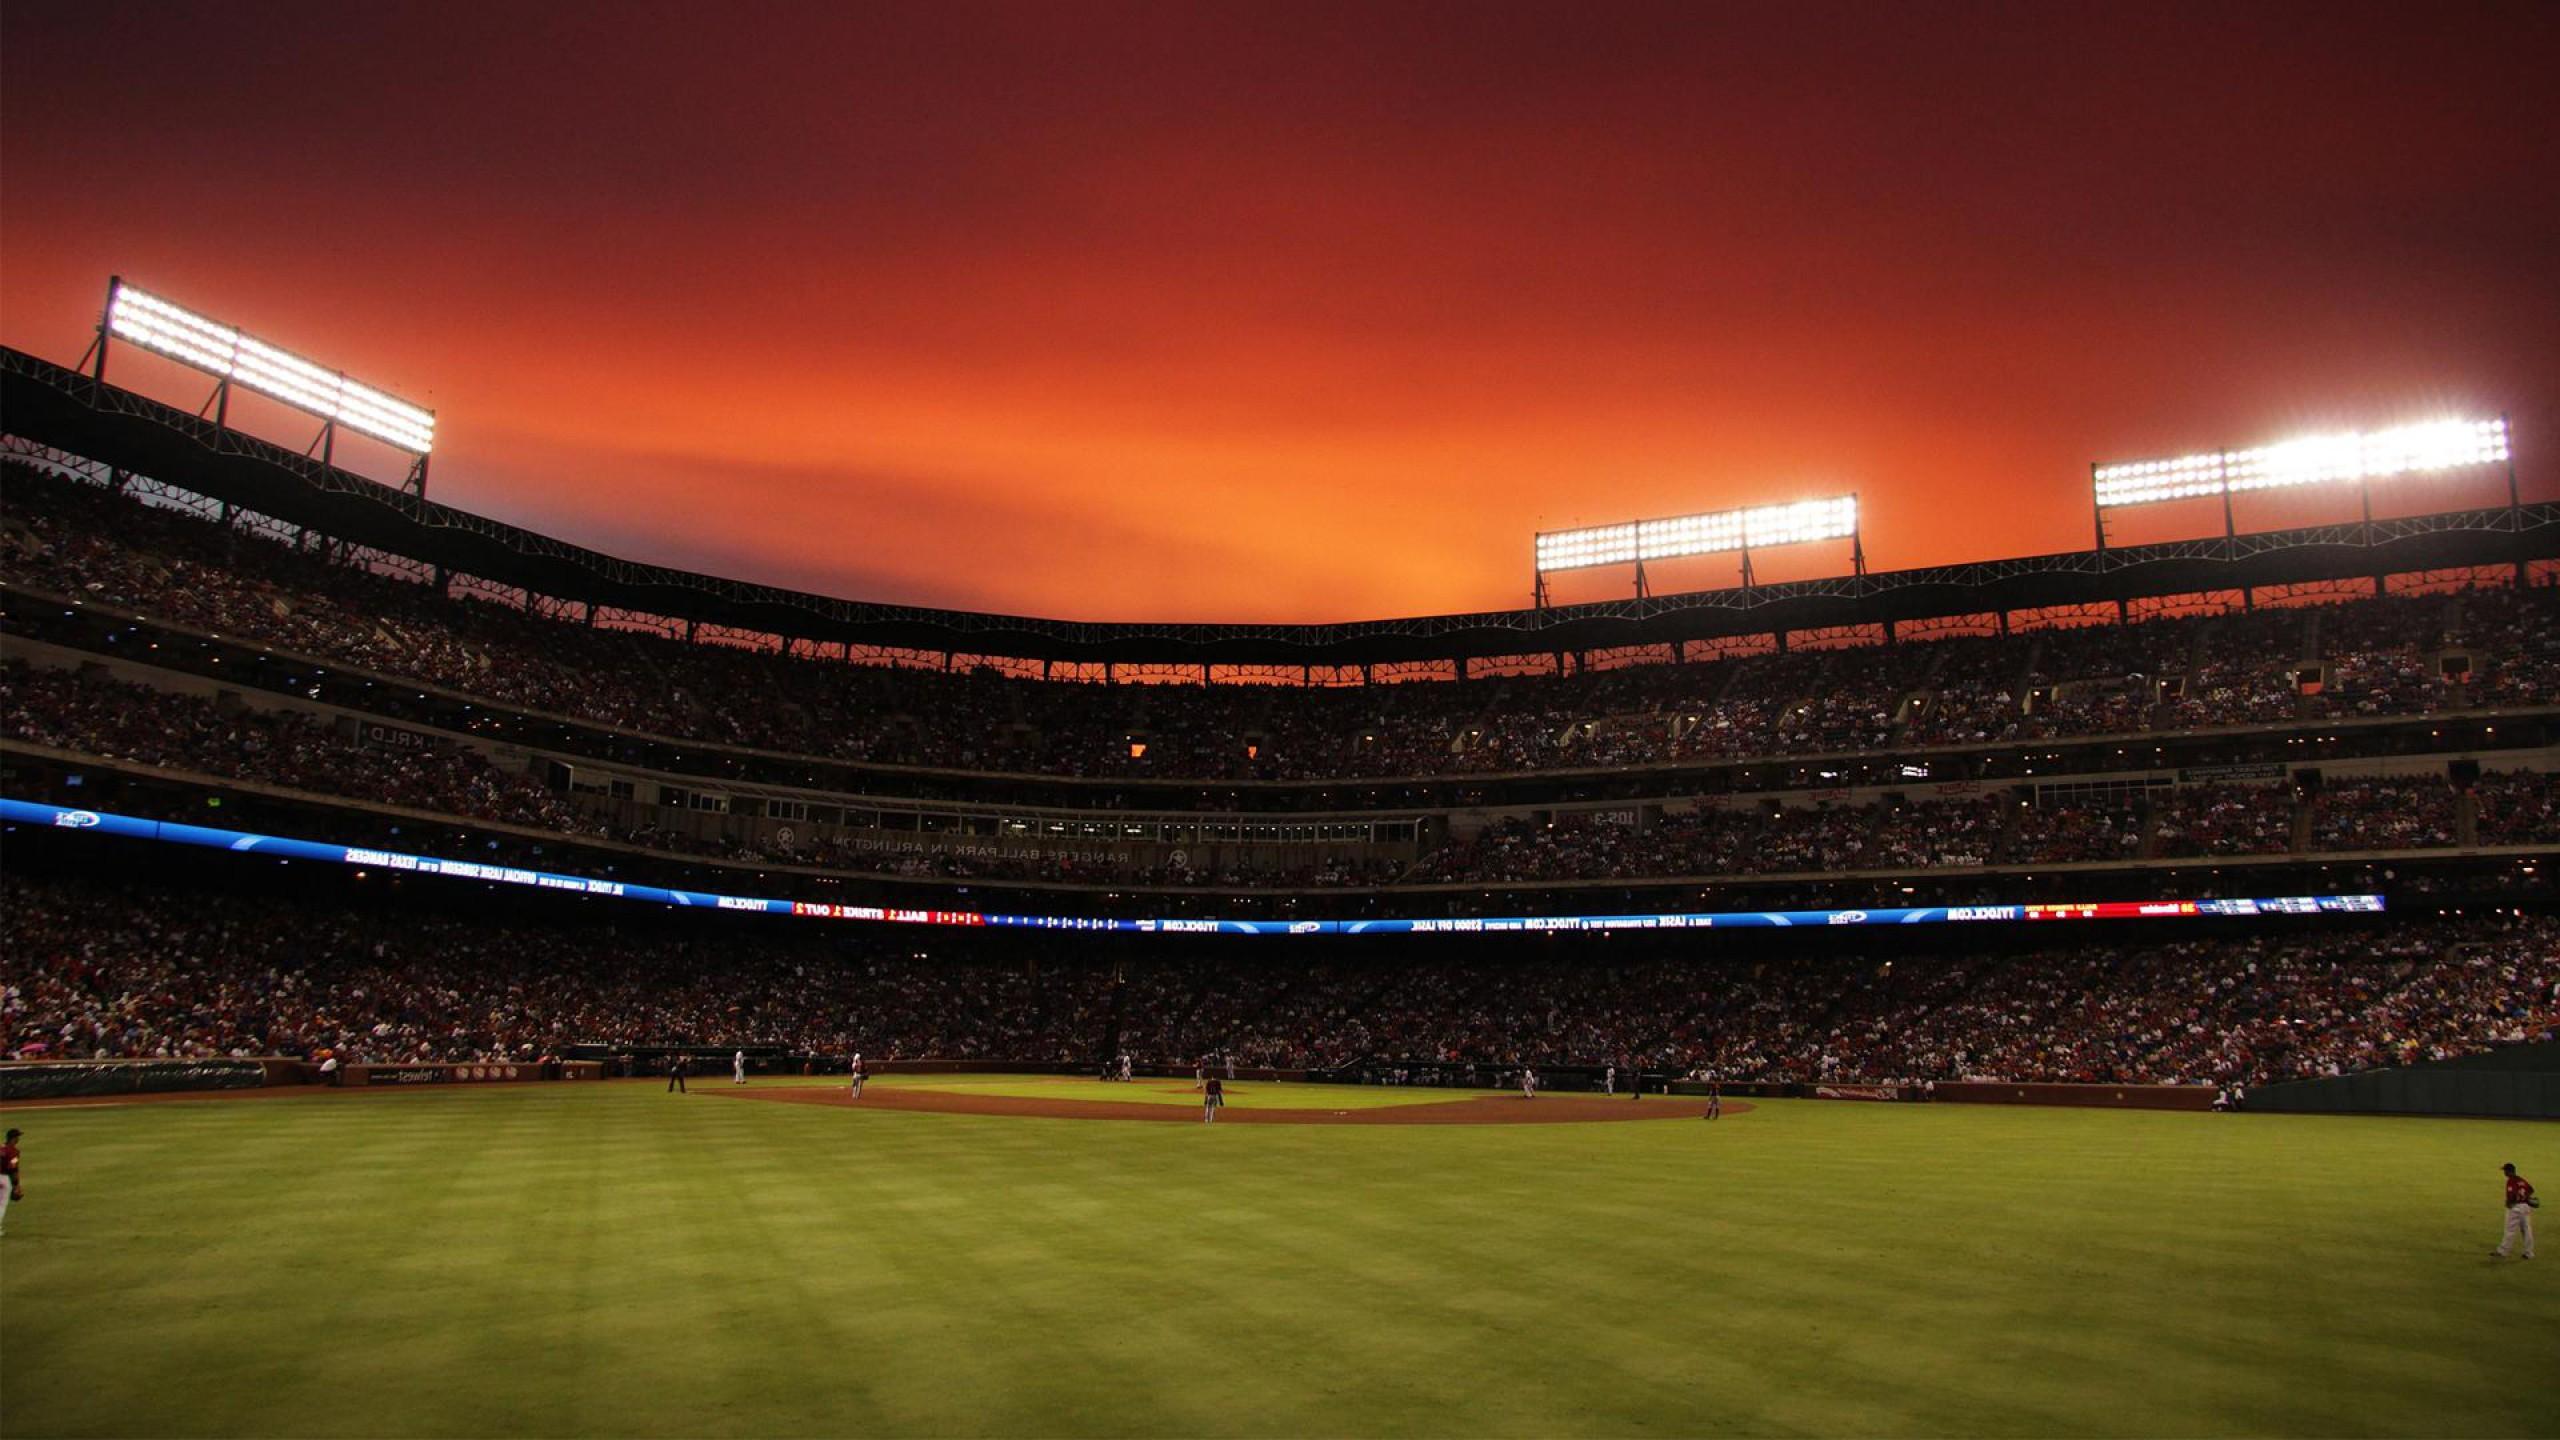 Res: 2560x1440, Baseball Field Wallpapers Hd